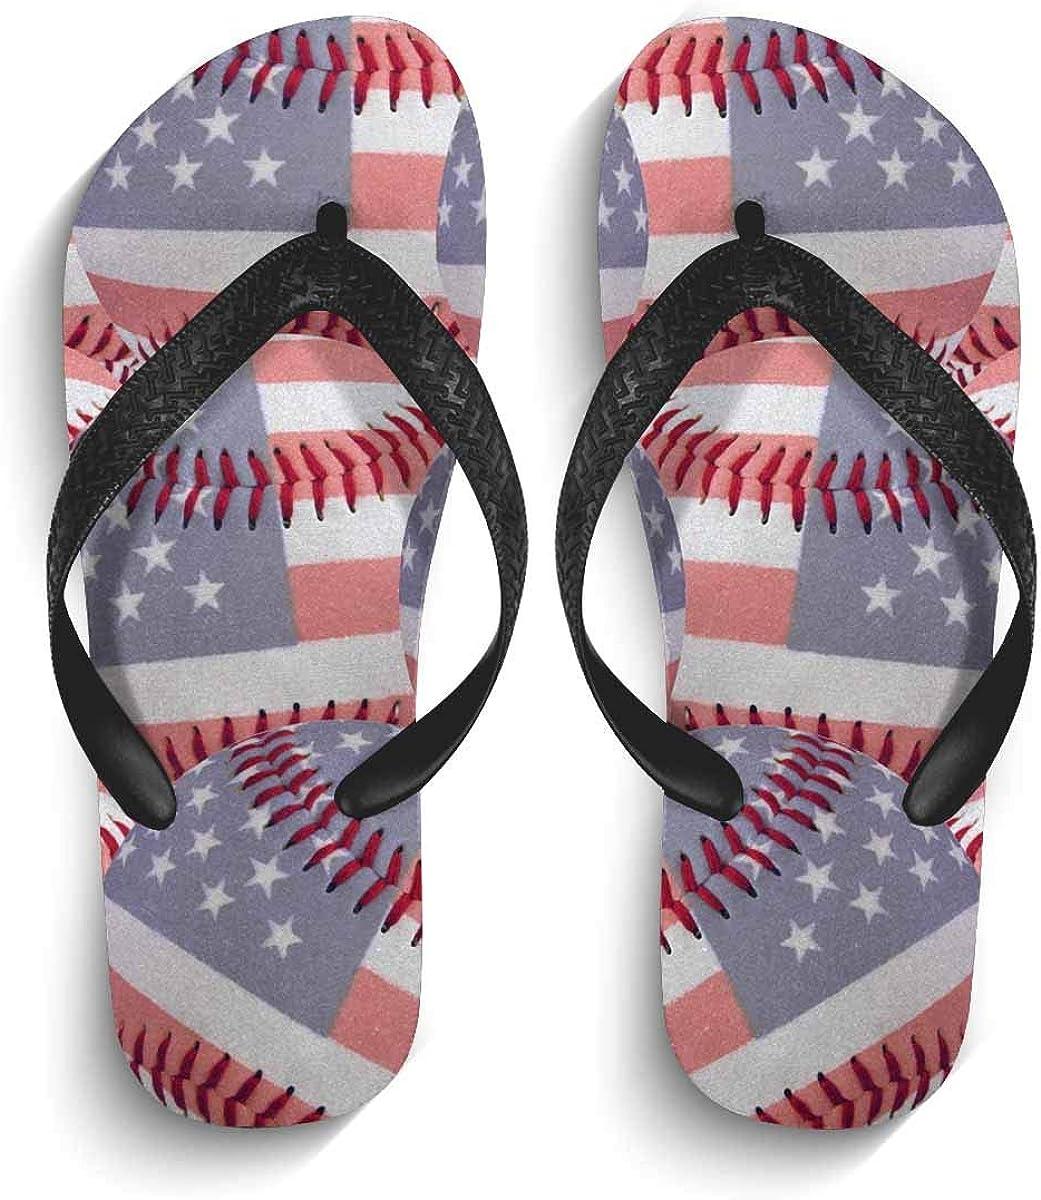 InterestPrint Men's Non-Slip Flip Flops Starfish Summer Holiday Tropical Beach Sea Sand Thongs Sandals for Beach Lounging Home